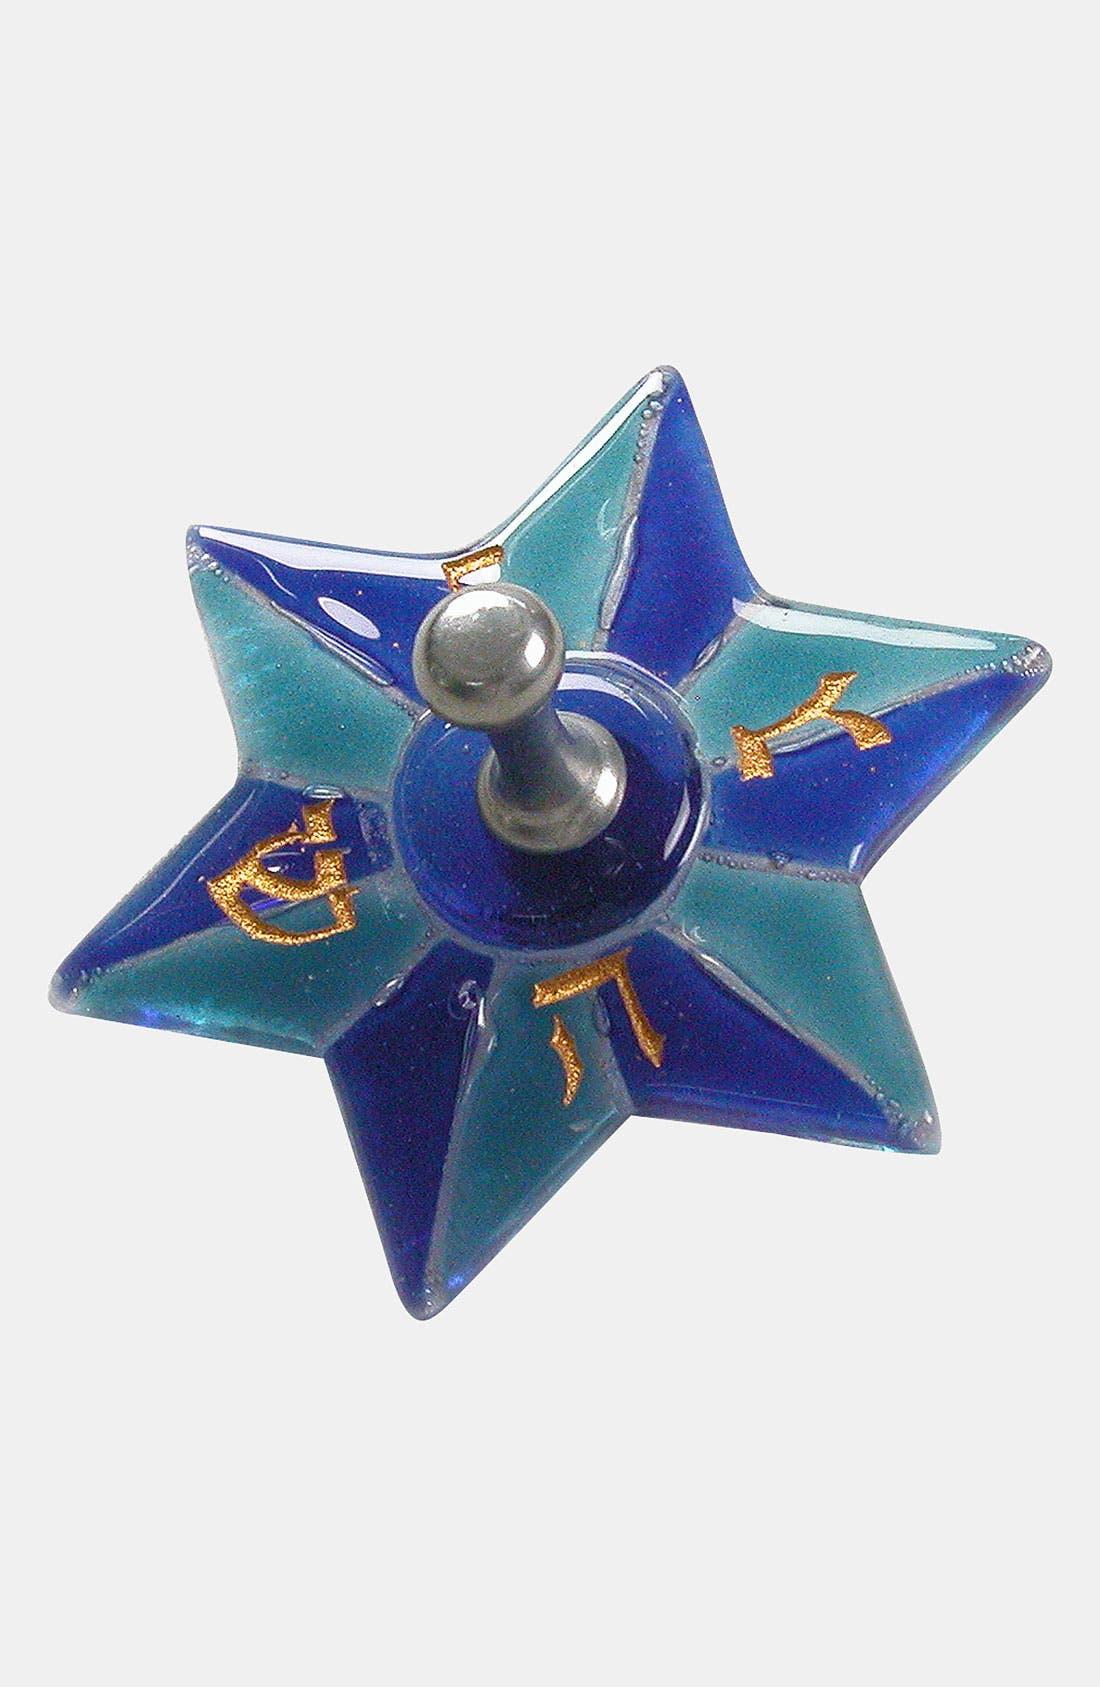 Main Image - Simple Touch Blue Aqua Star Dreidel